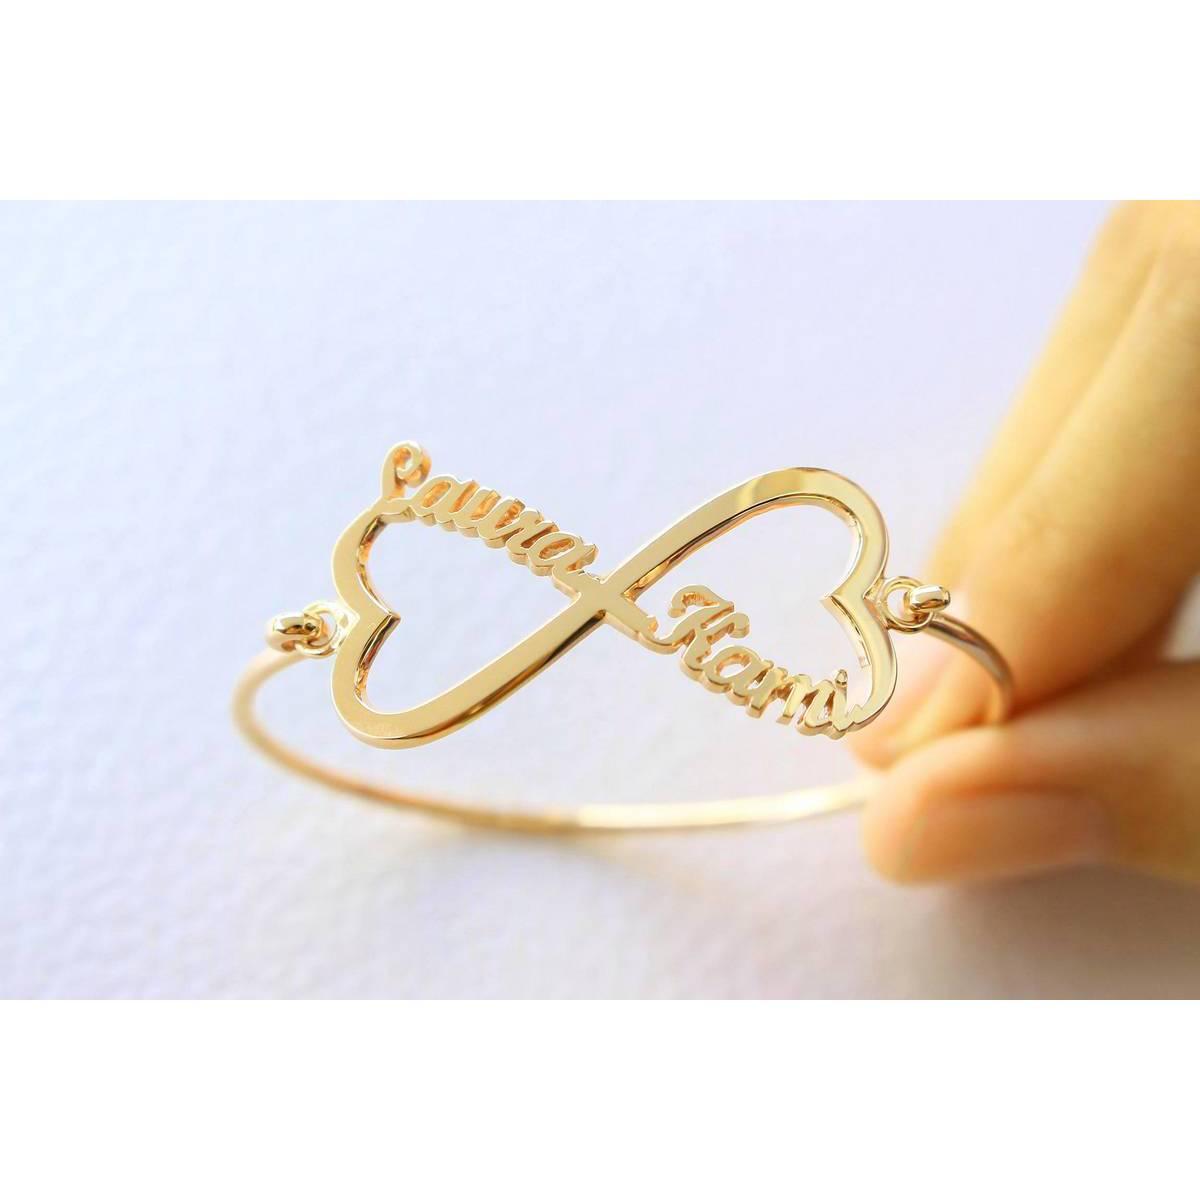 Infinity Design Custom Made Gold Plated Double Name Bangle Bracelet